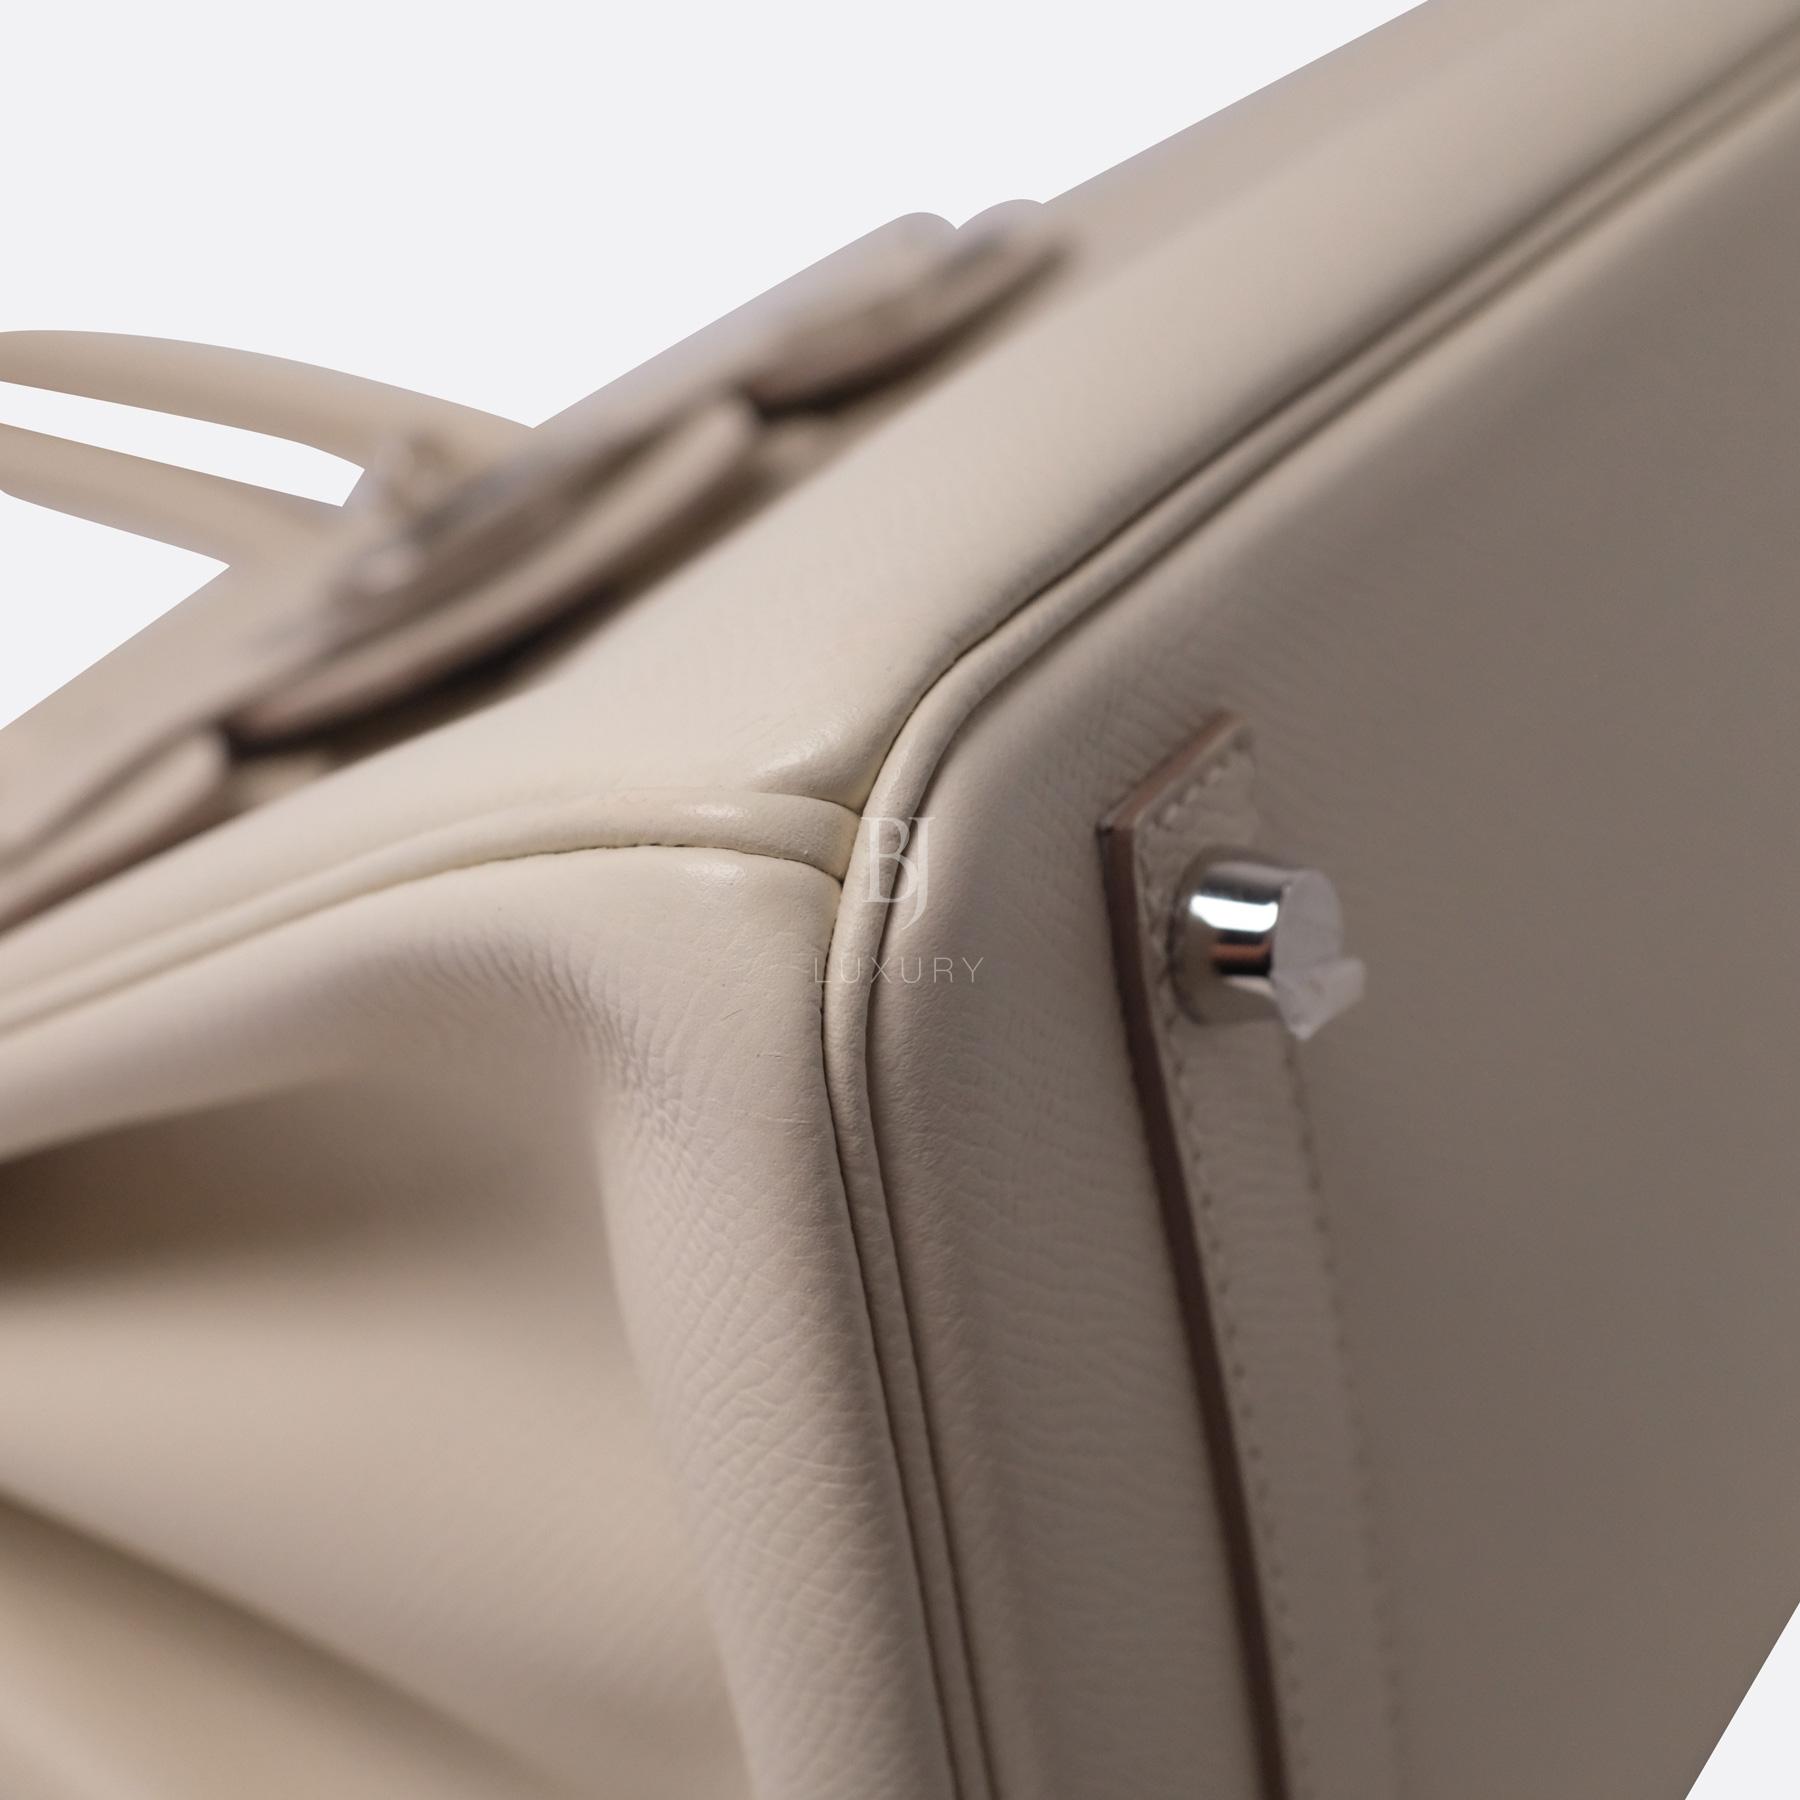 Hermes Birkin 30 Epsom Craie Palladium BJ Luxury 13.jpg